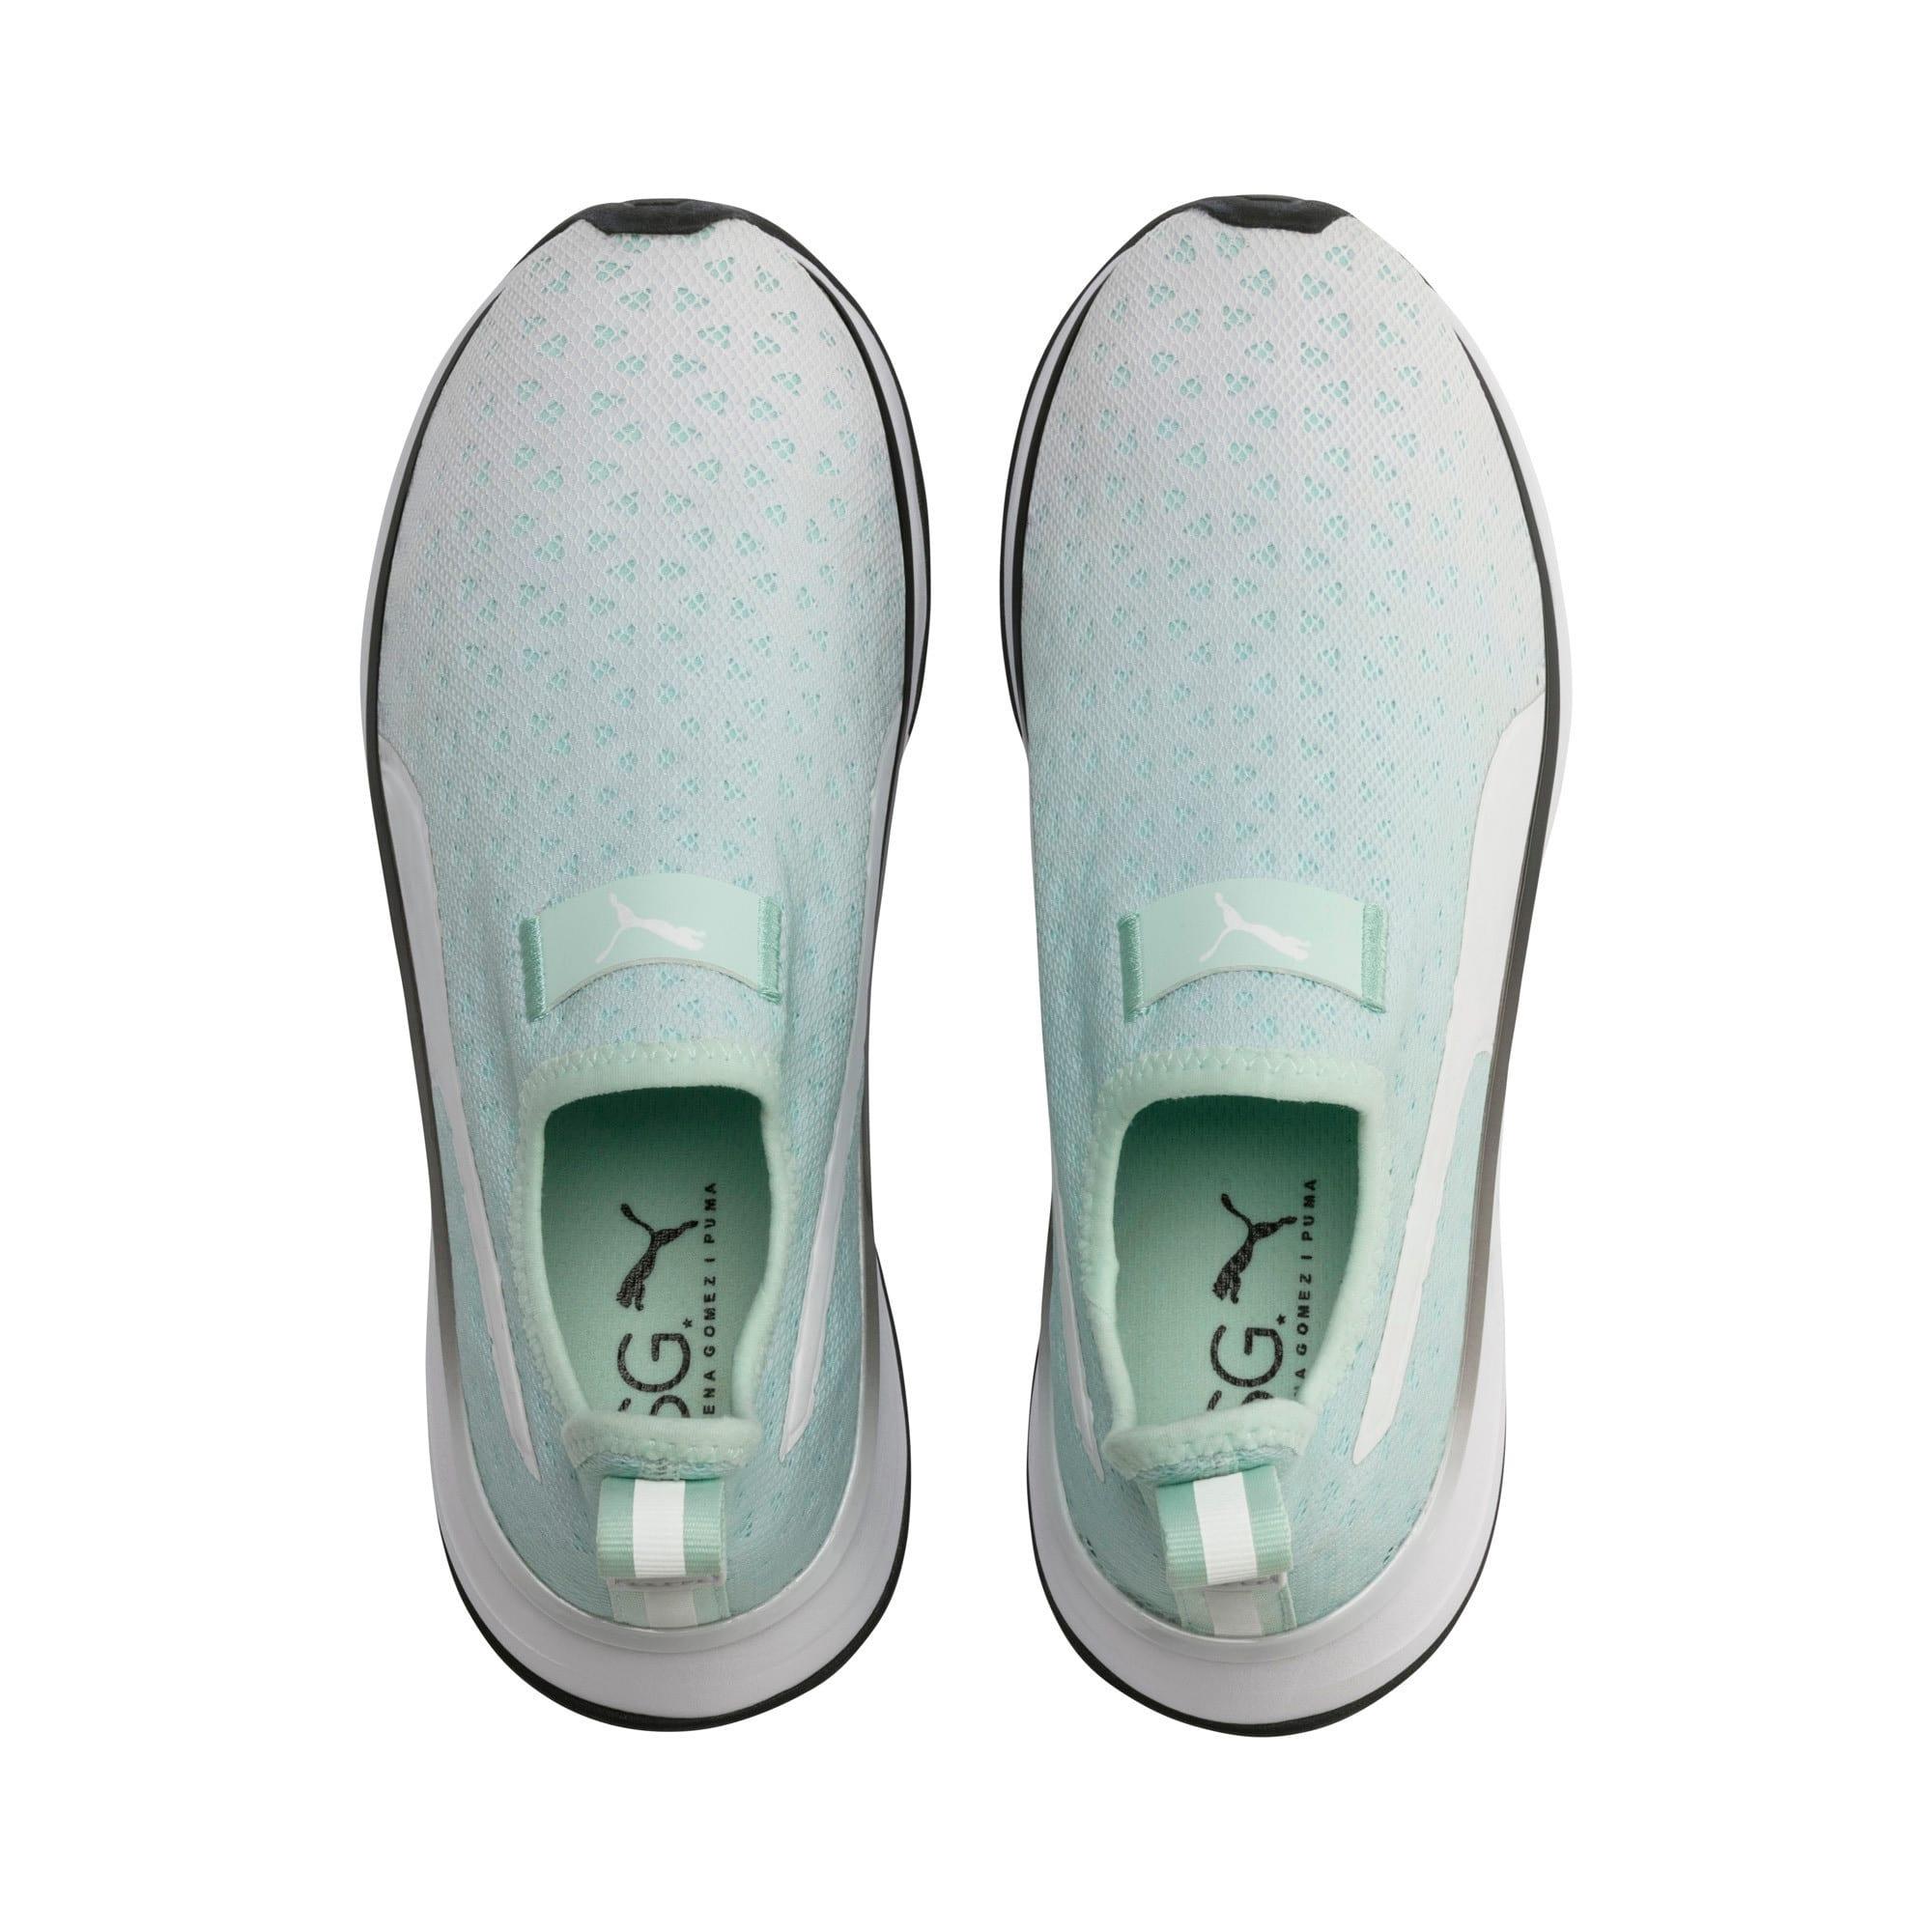 Thumbnail 7 of PUMA x SELENA GOMEZ Slip-On Women's Training Shoes, Fair Aqua-Puma Black, medium